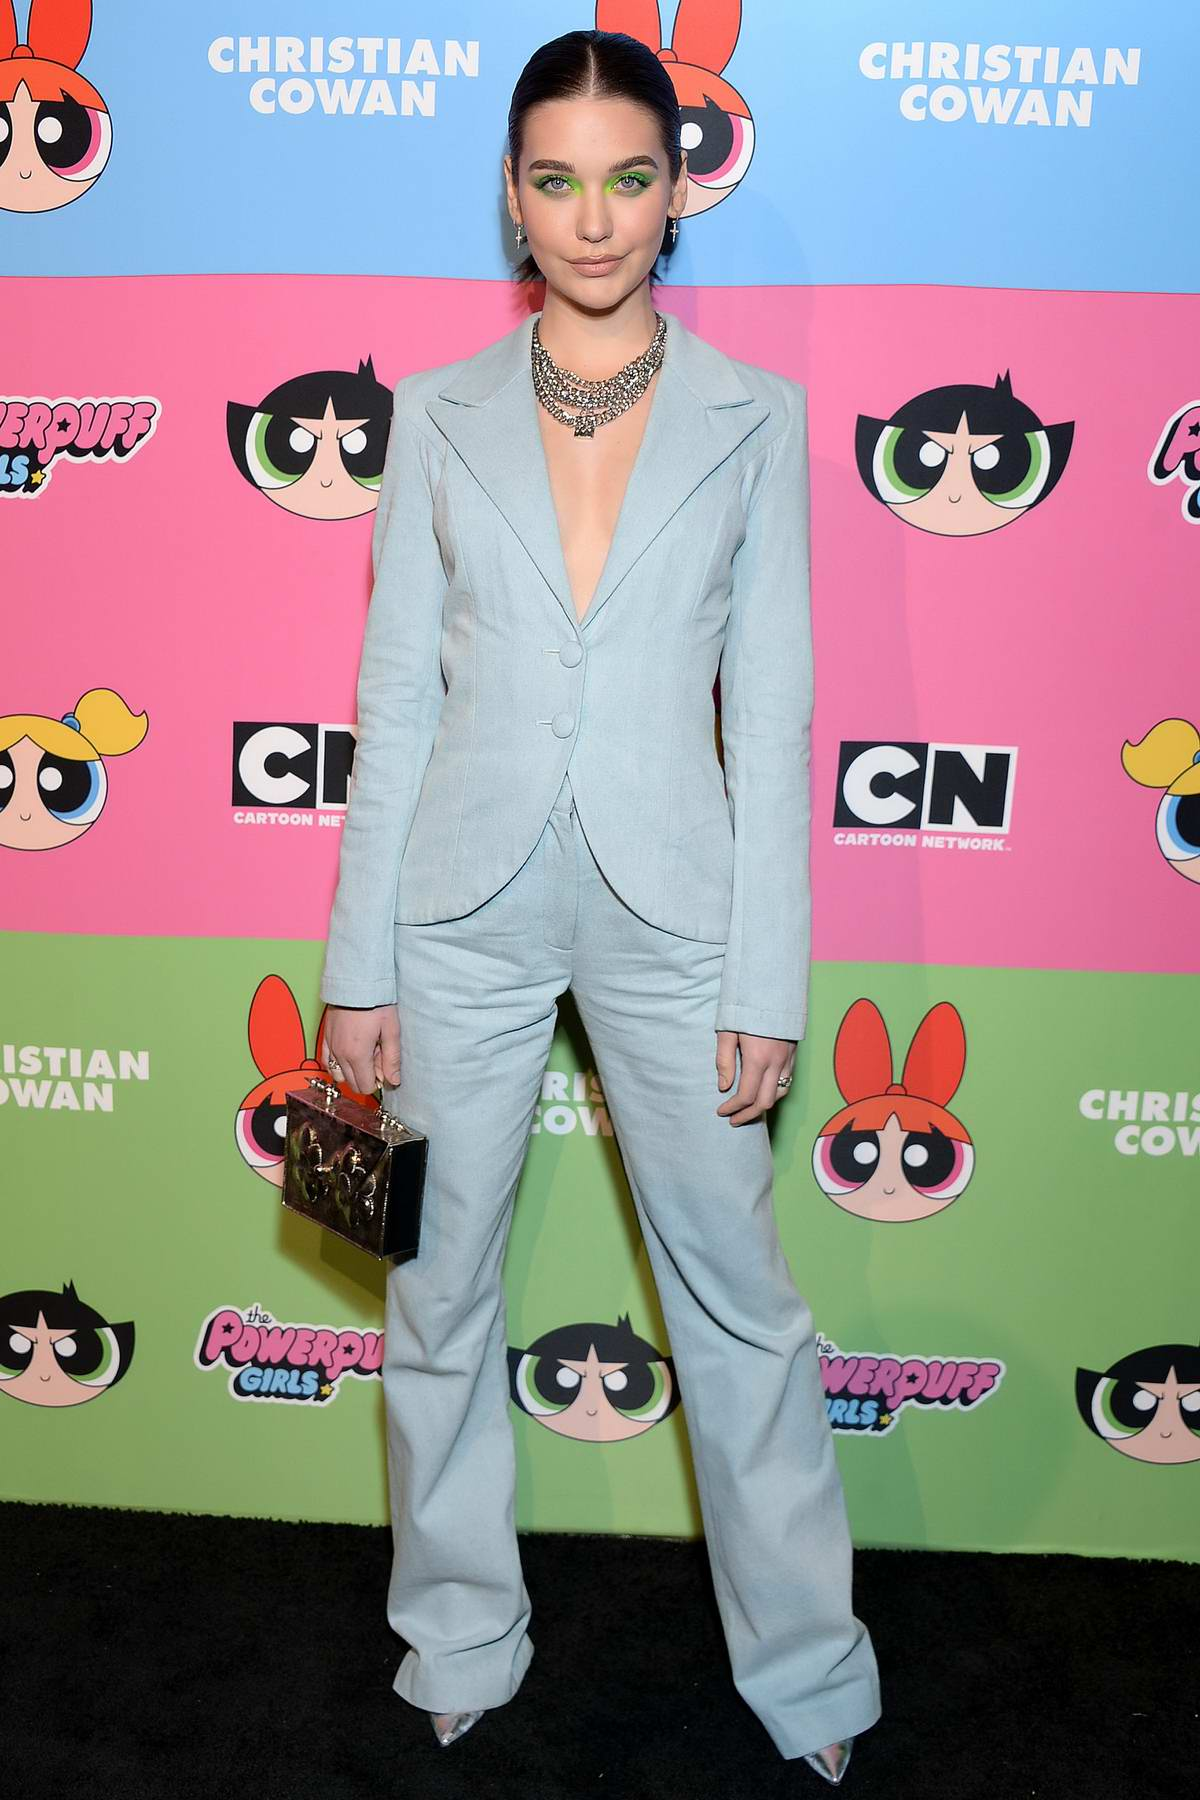 Amanda Steele attends Christian Cowan x Powerpuff Girls Runway Show in Los Angeles